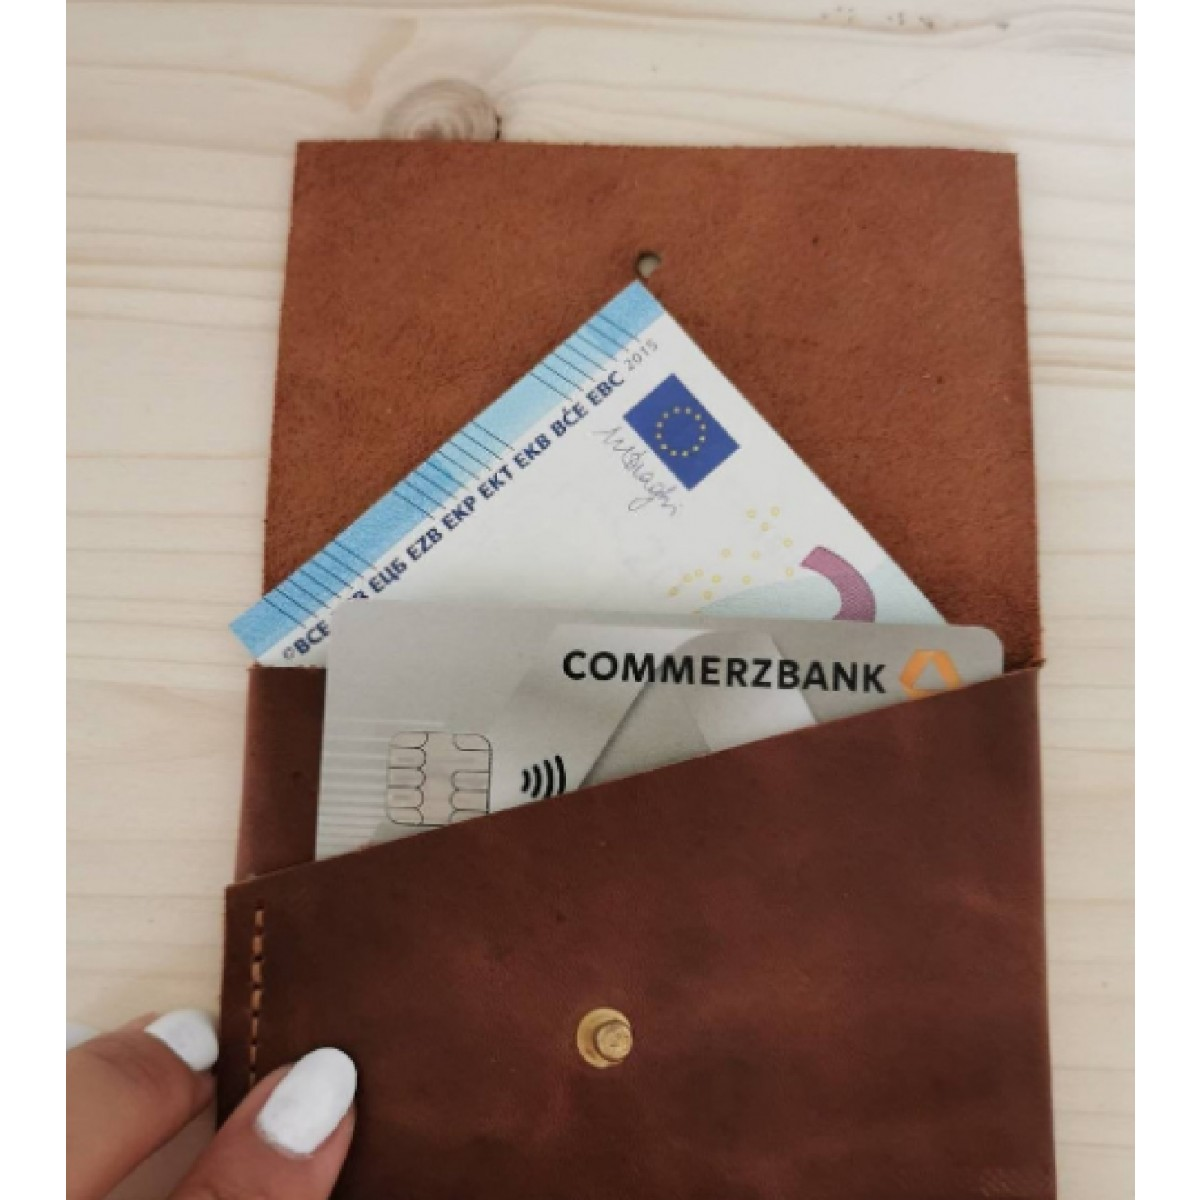 BSaite / Mini Leder Portemonnaie / kleine Leder Geldbörse / Leder Kartenetui / Unisex